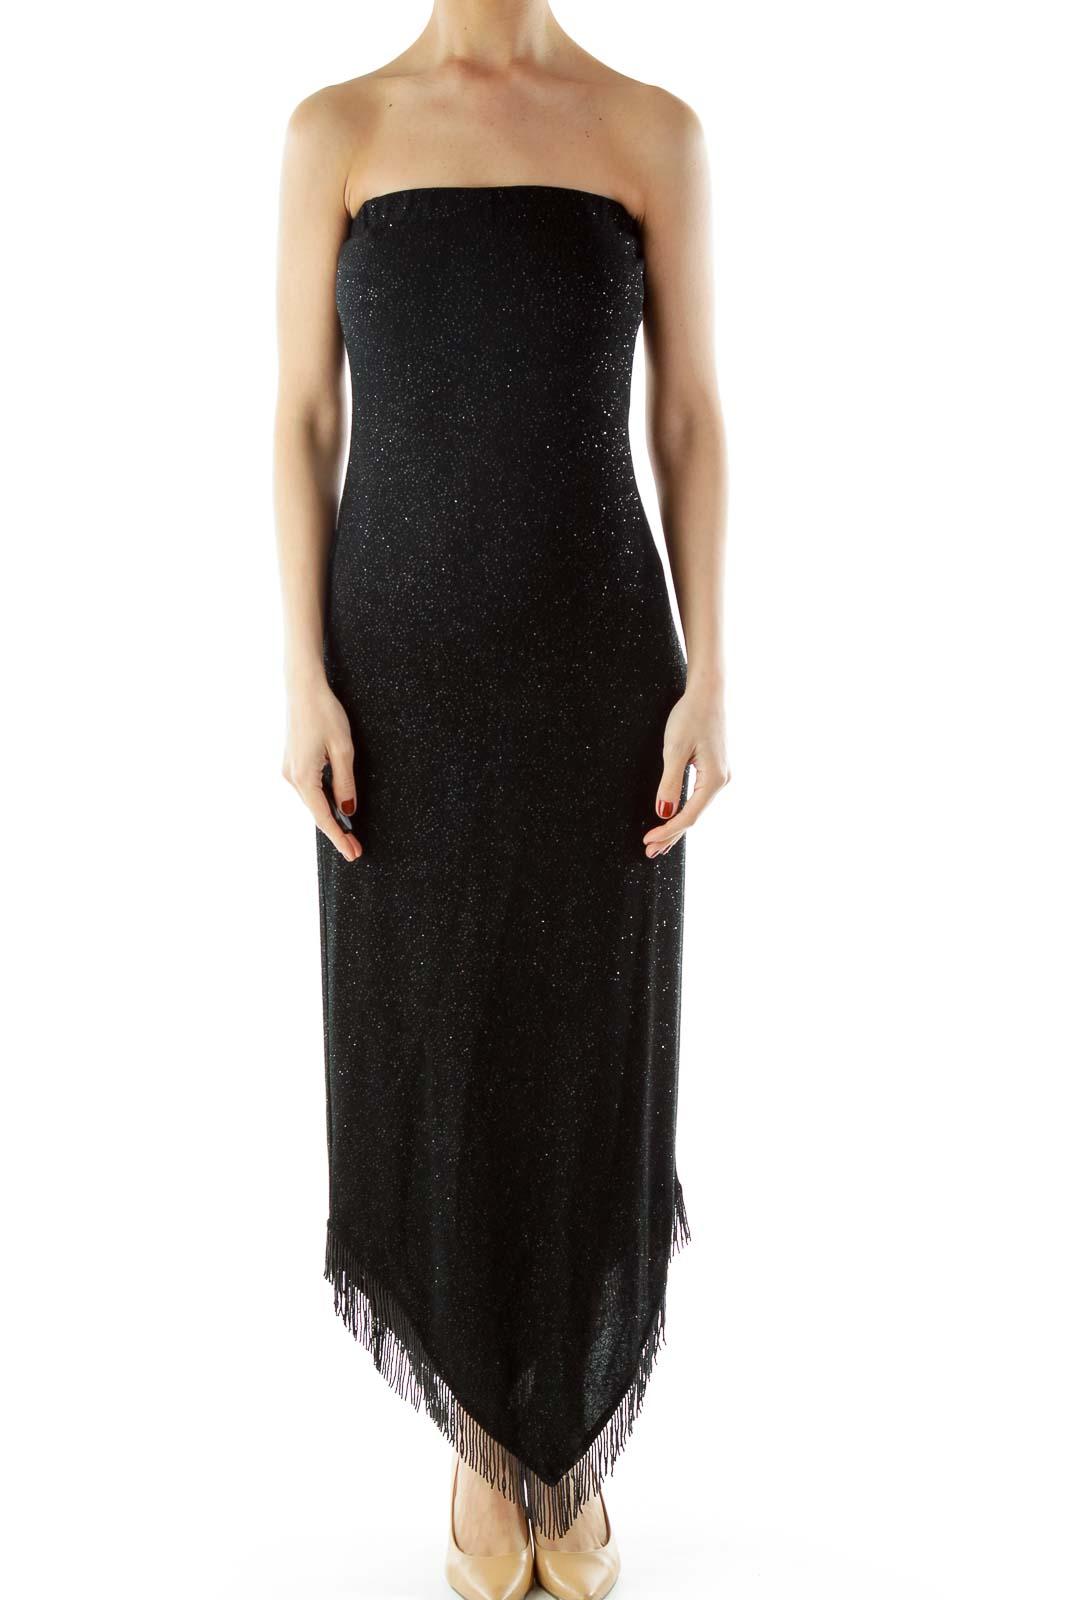 Black Dress with Beaded Fringe Front